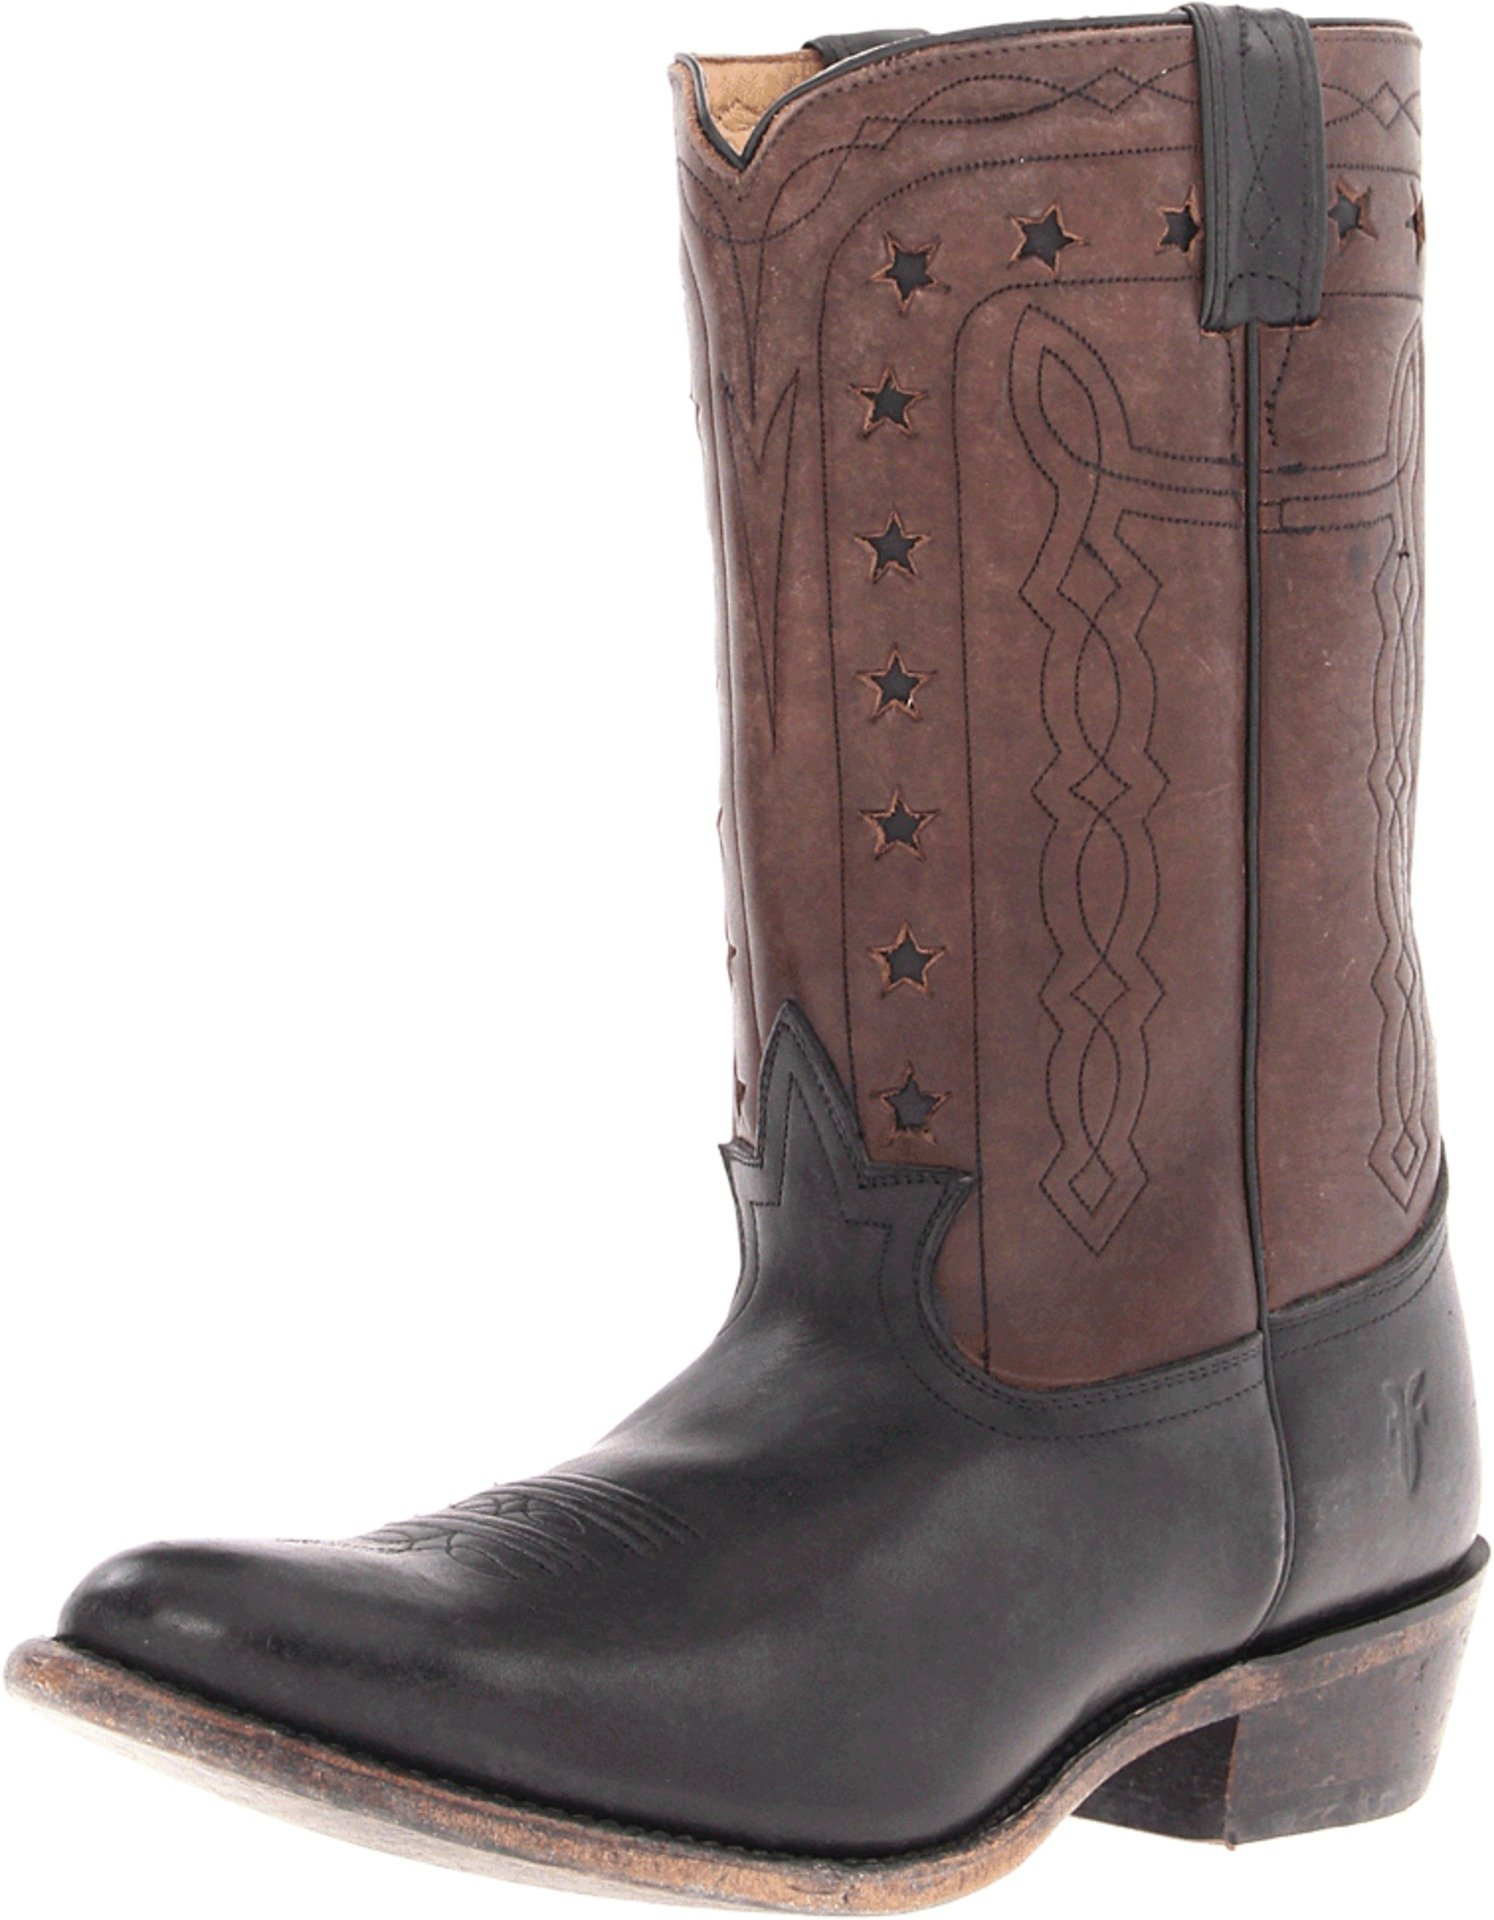 FRYE Men's Wyatt Americana Boot, Black Stone Antiqued, 7.5 M US